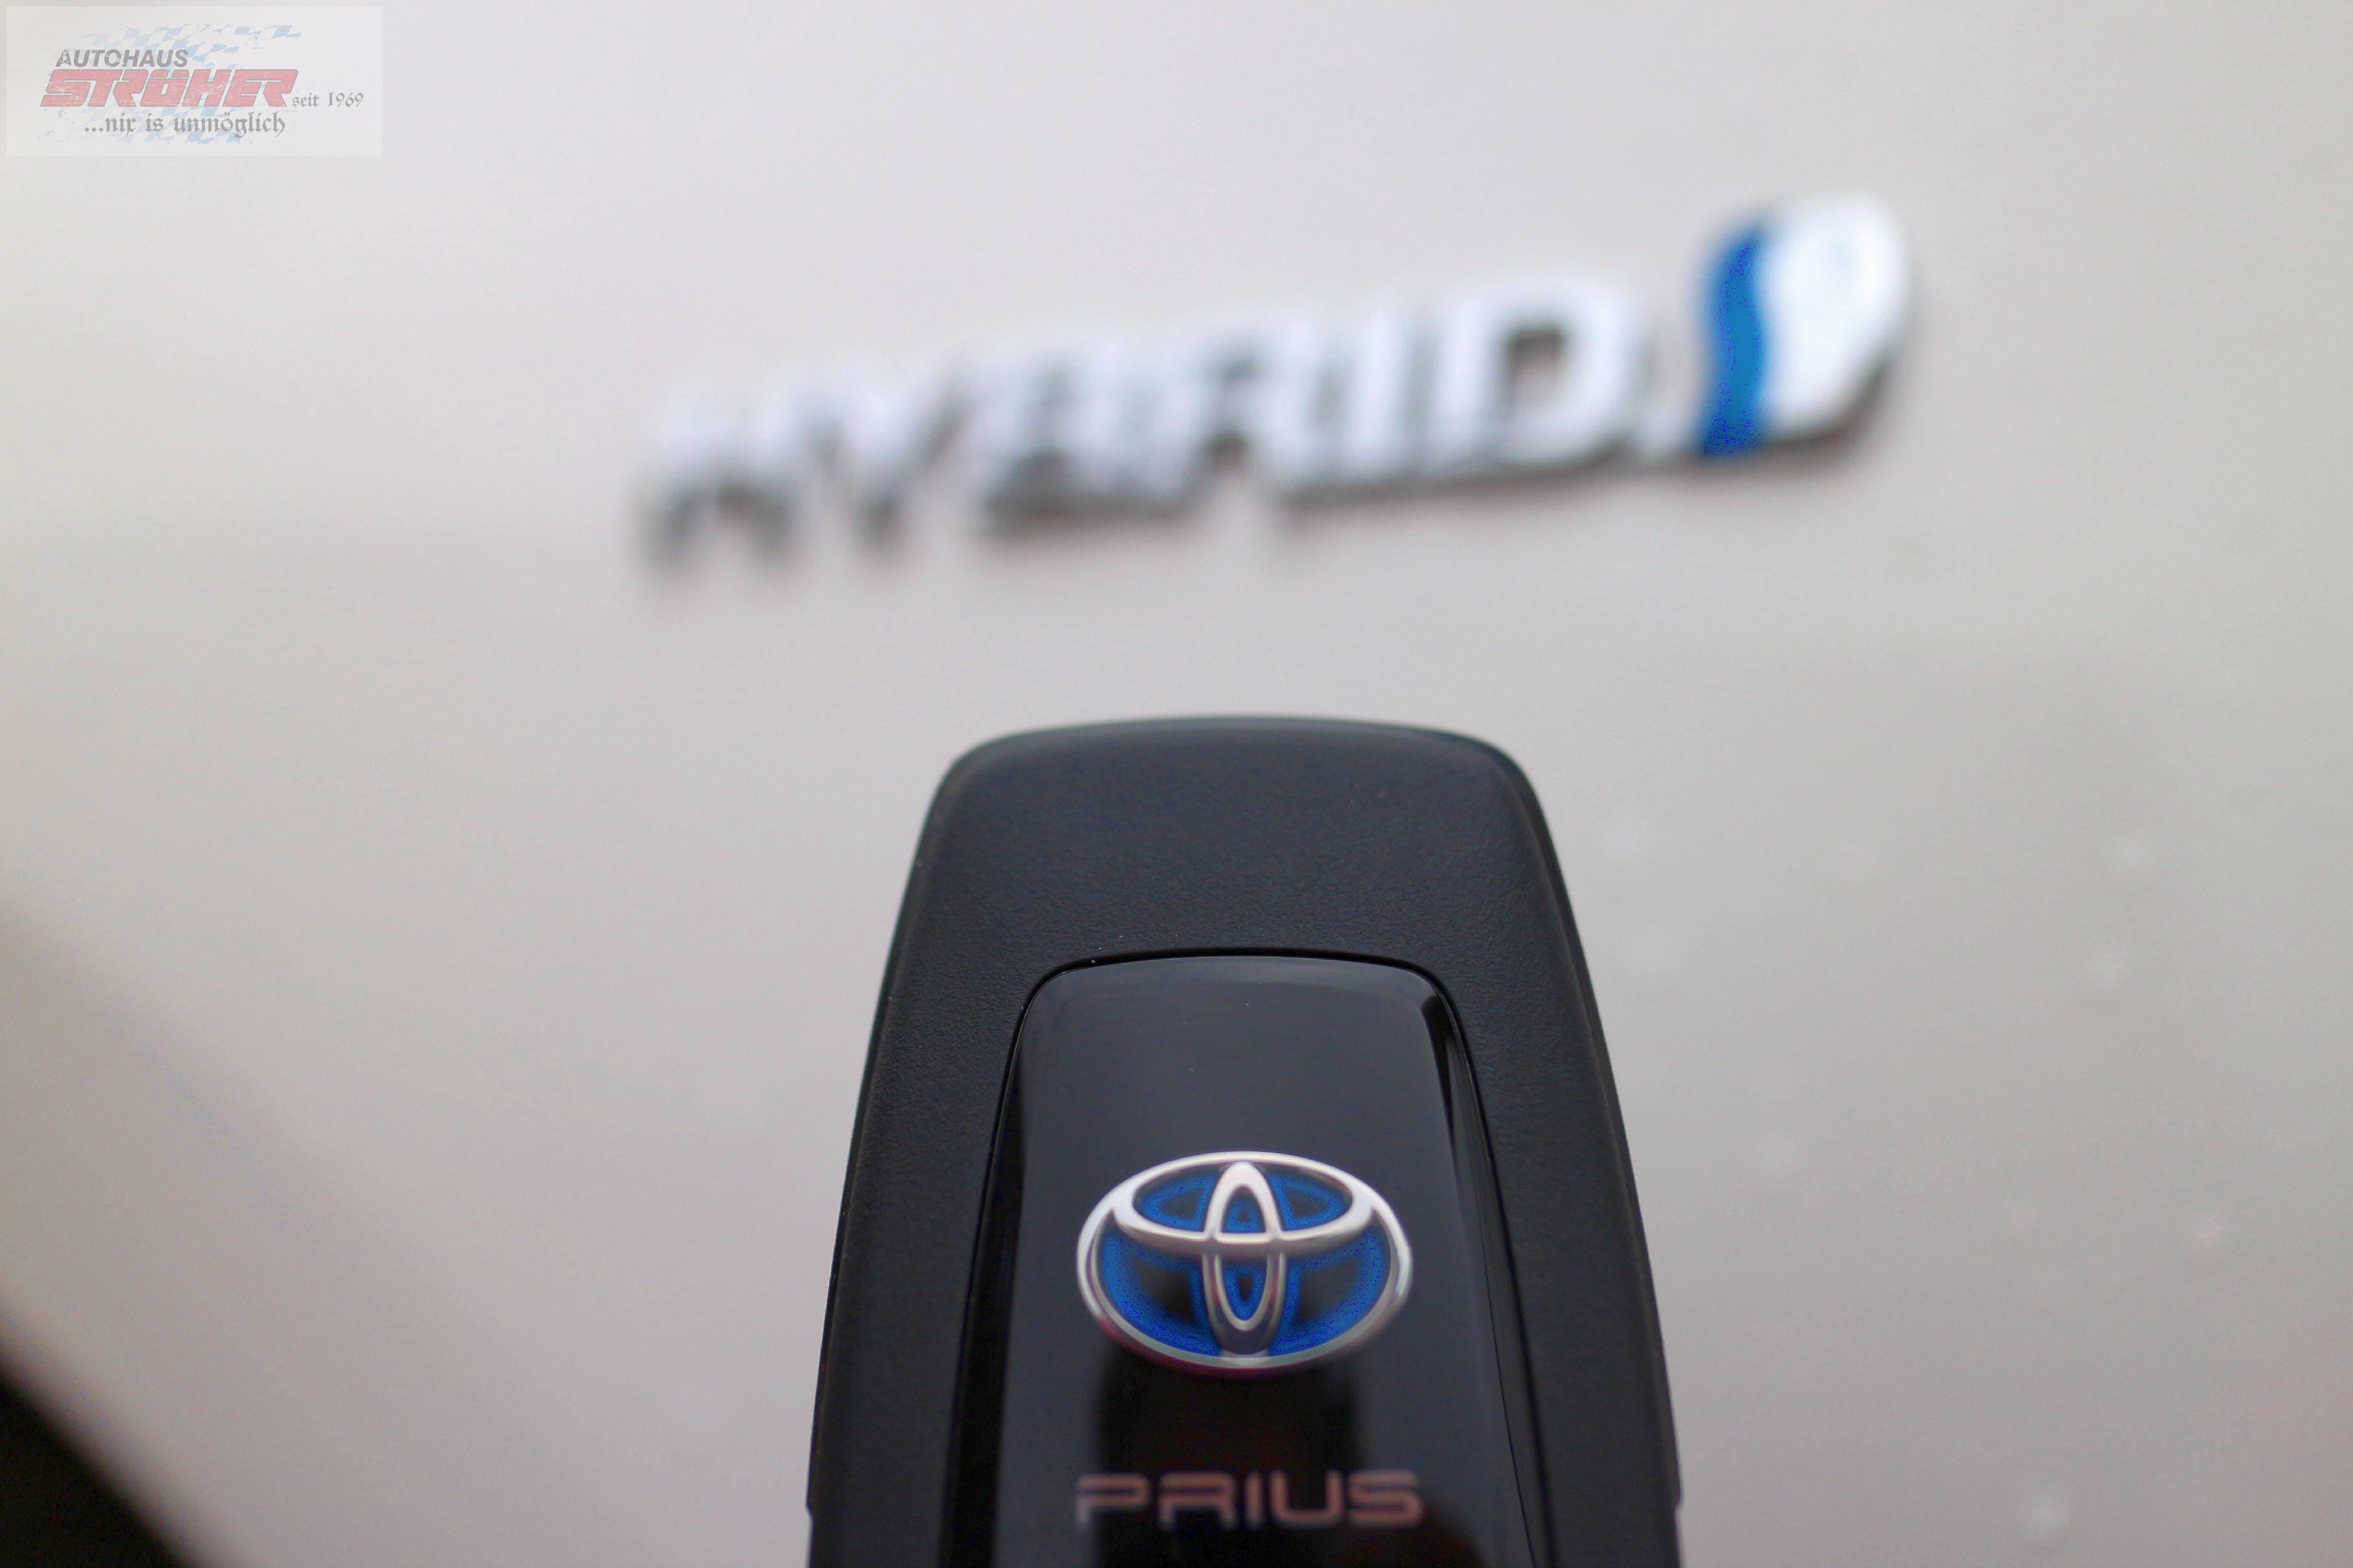 Prius201601